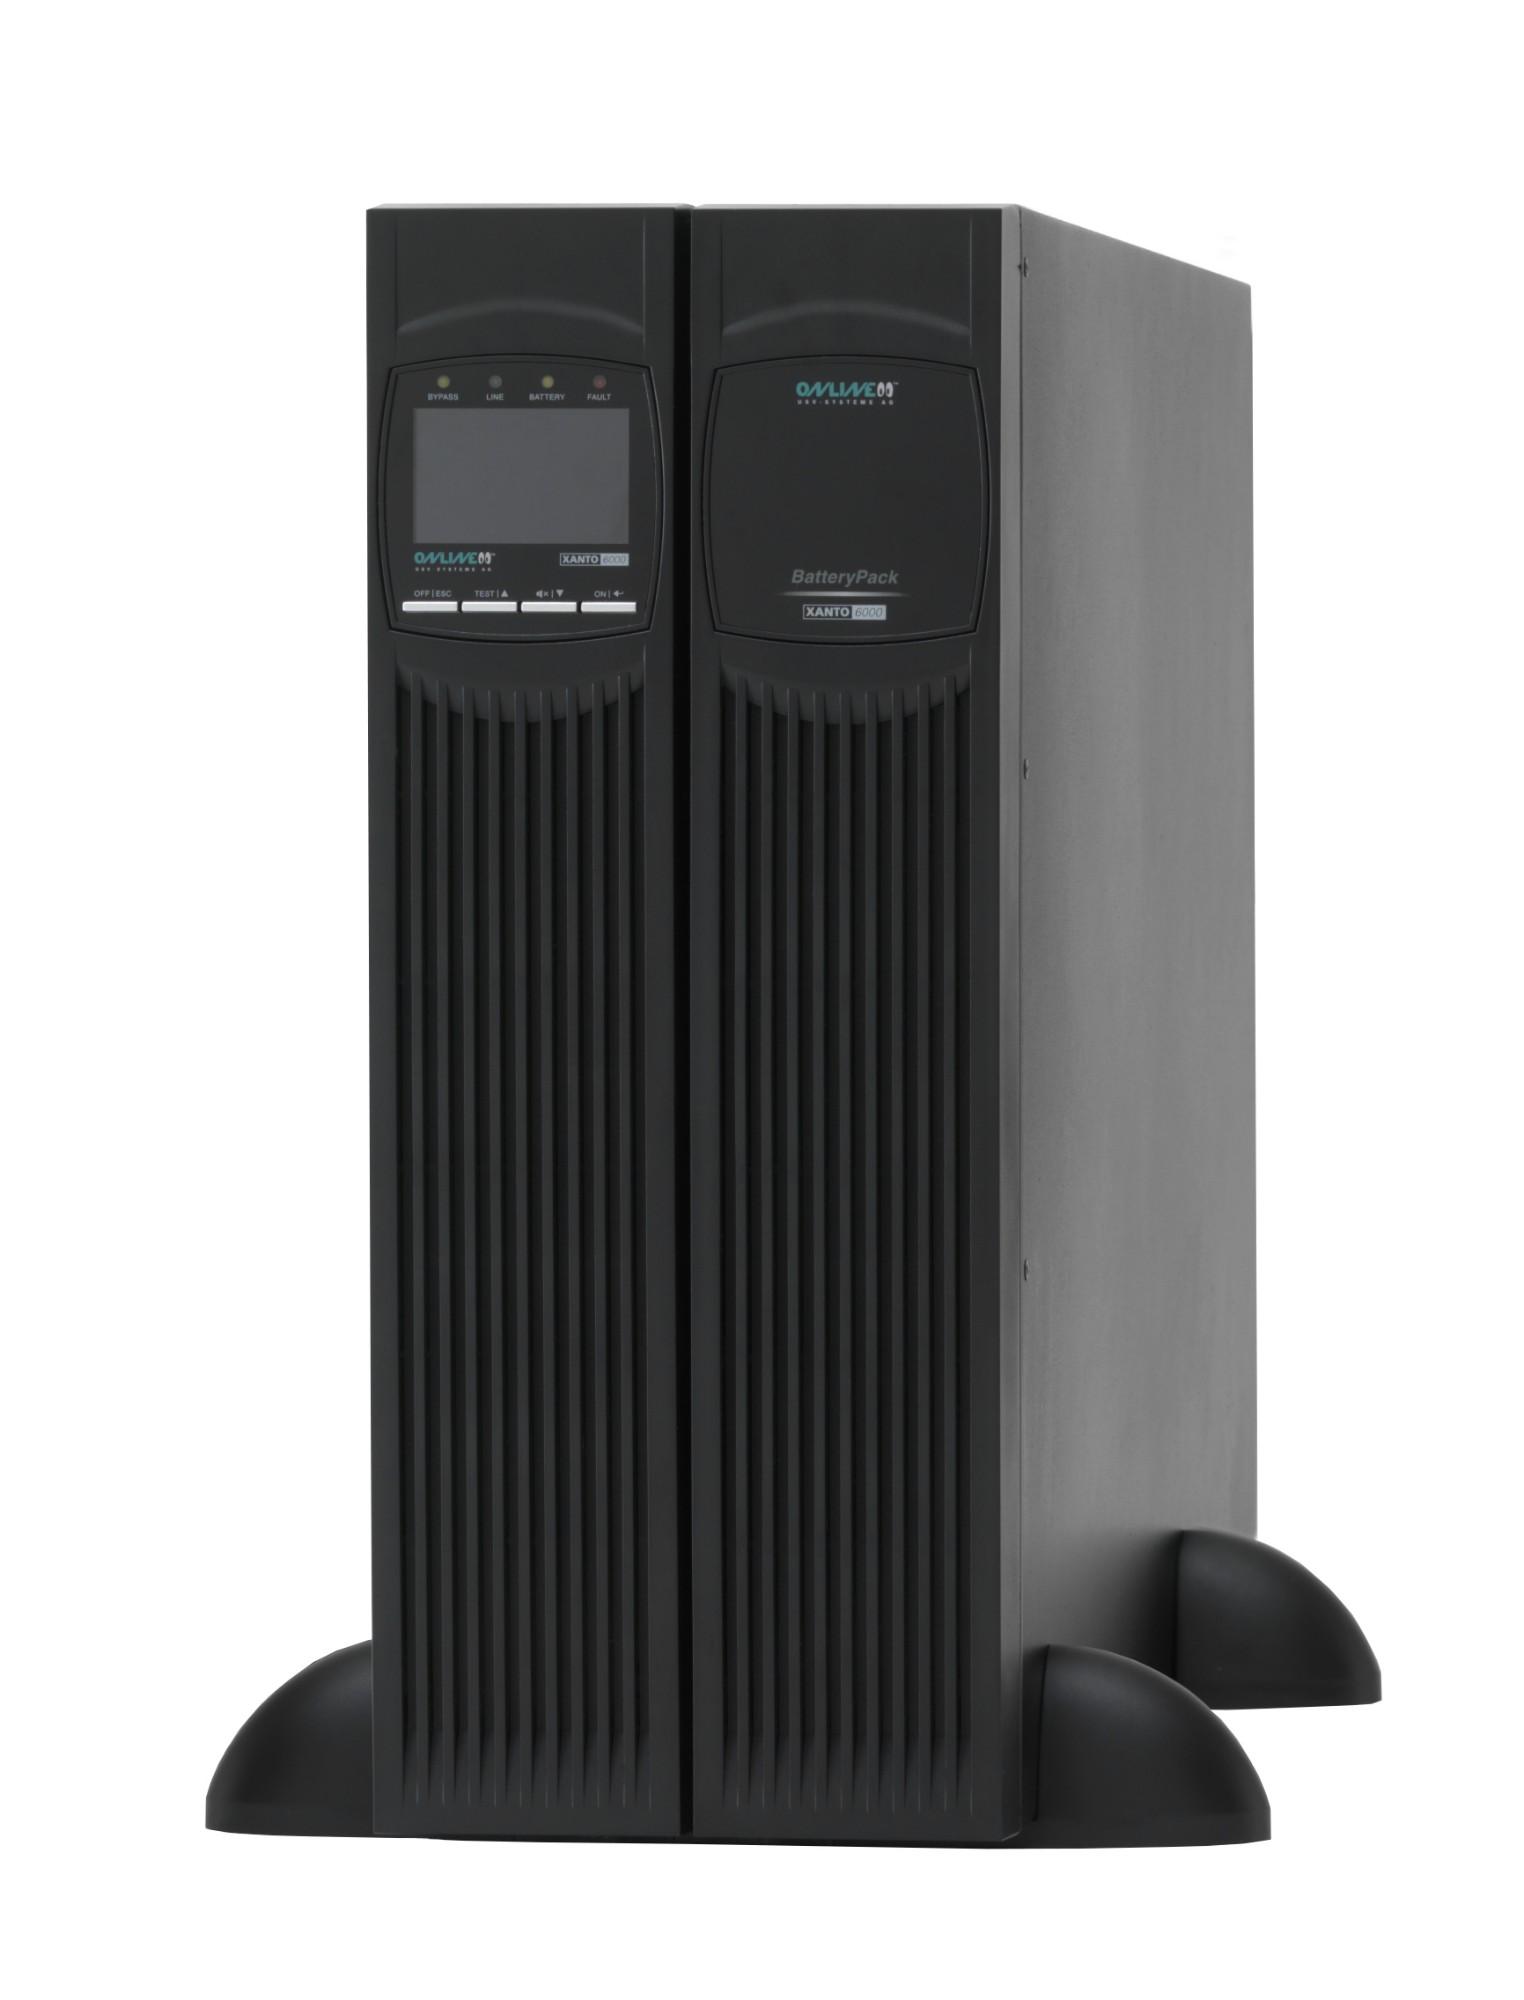 ONLINE USV-Systeme XANTO 6000 uninterruptible power supply (UPS) Double-conversion (Online) 6000 VA